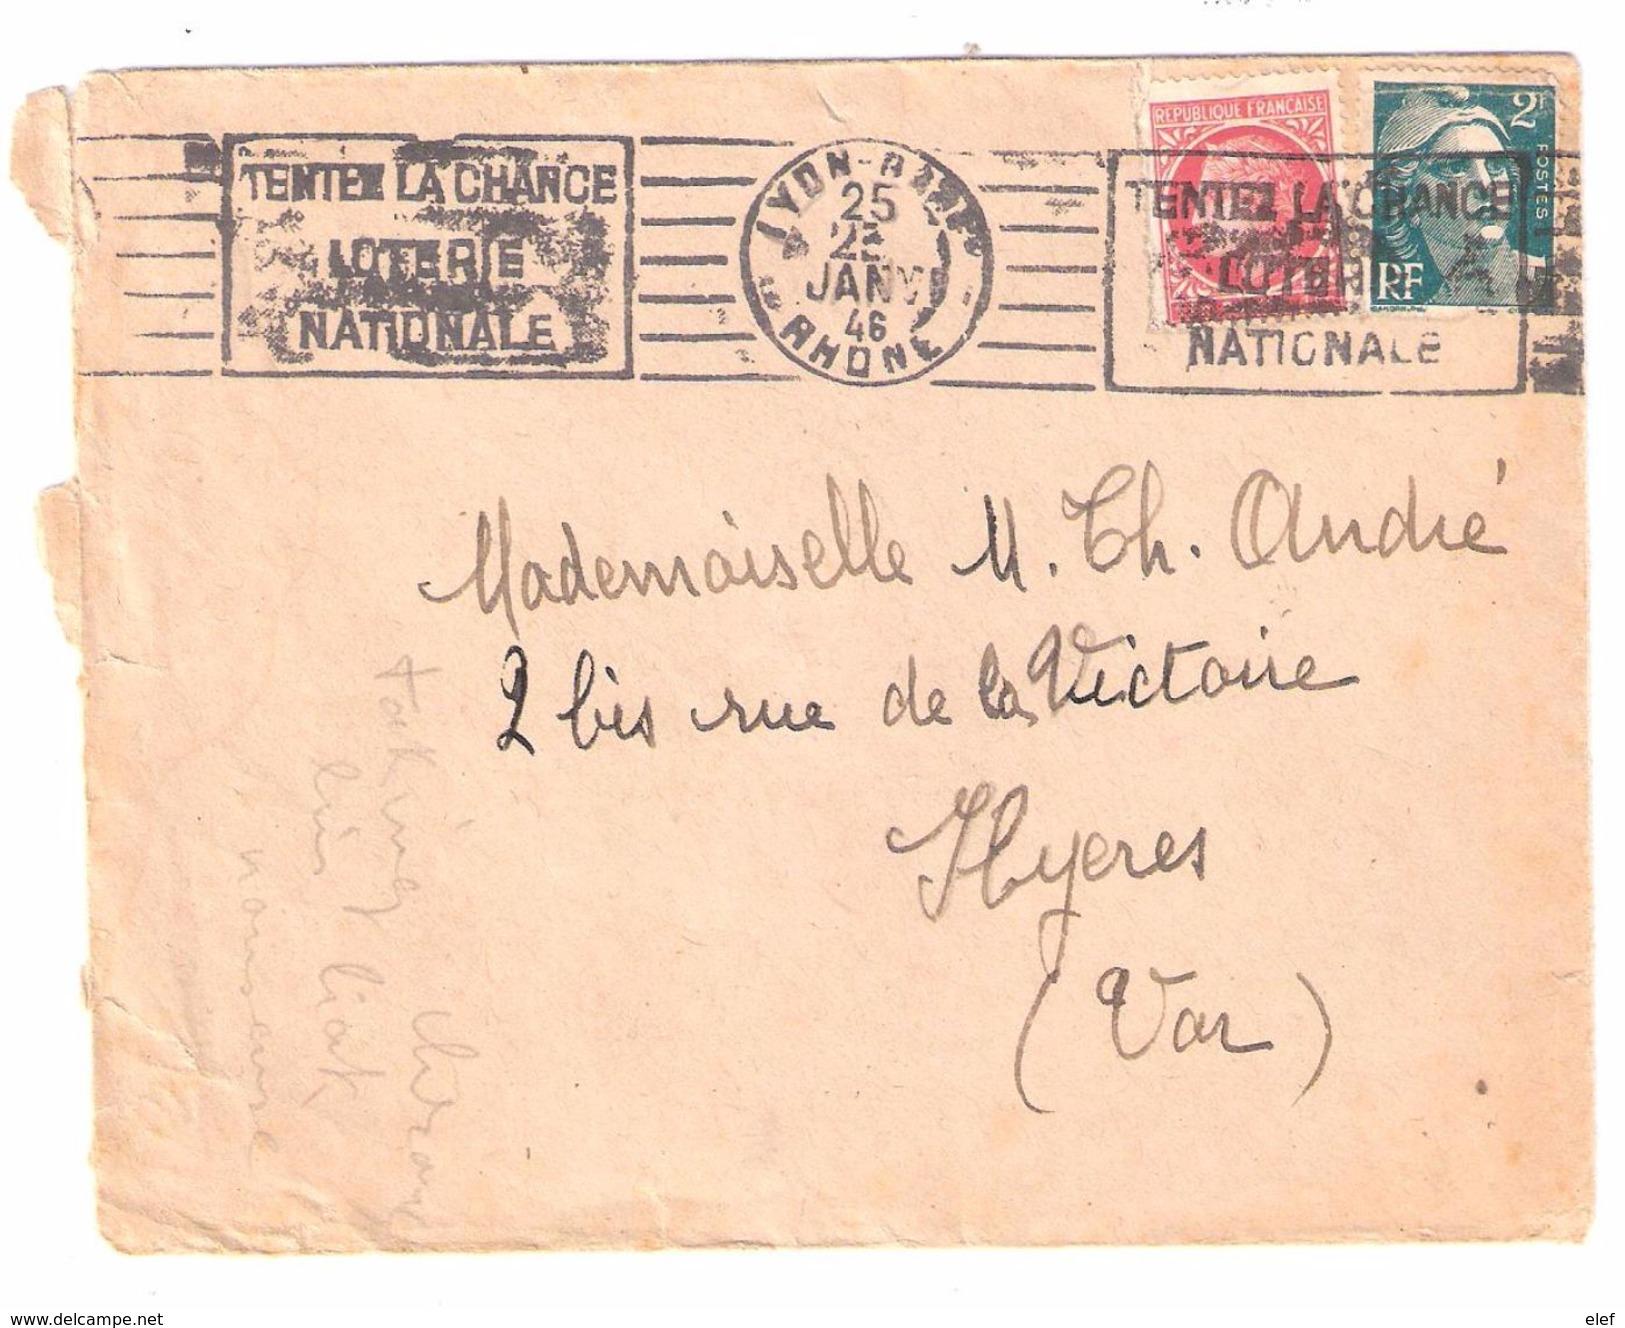 JEU :Lettre De LYON GARE Flamme TENTEZ LA CHANCE LOTERIE NATIONALE ; Gandon + Mazelin 1946, TB - Giochi